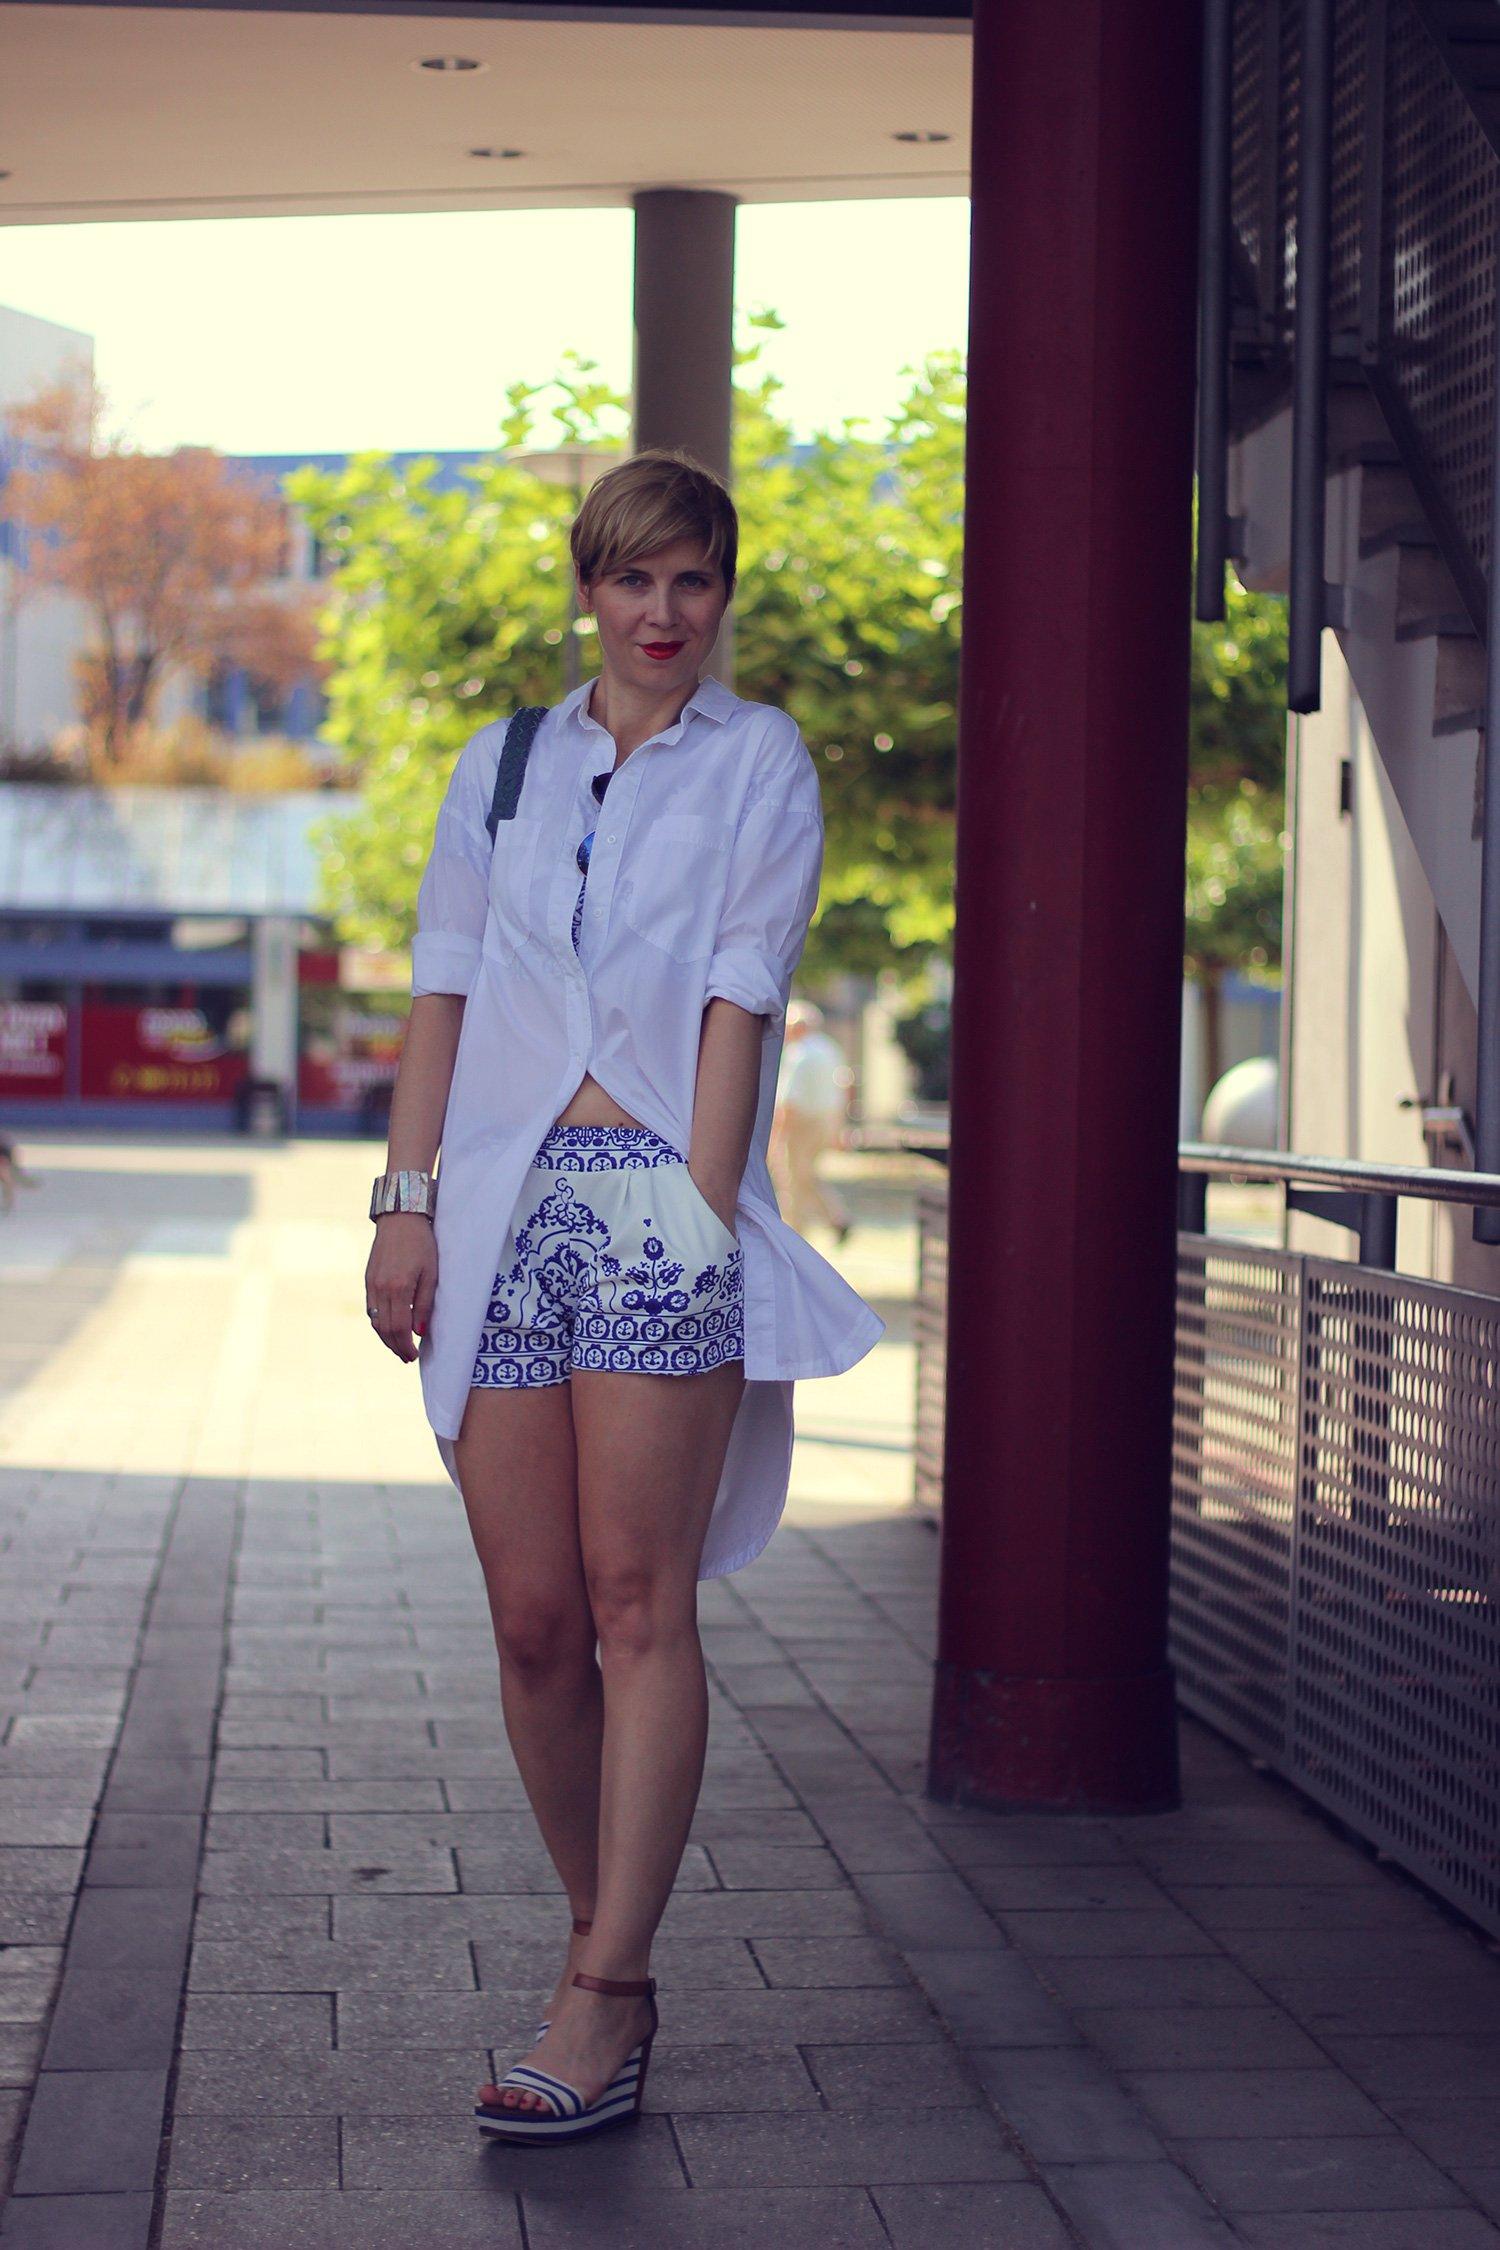 IMG_9650a_Zweiteiler_shorts_blusenkleid_H&M_Blue_Blau_AHemadundaHos_40+style_Fashionoverforty